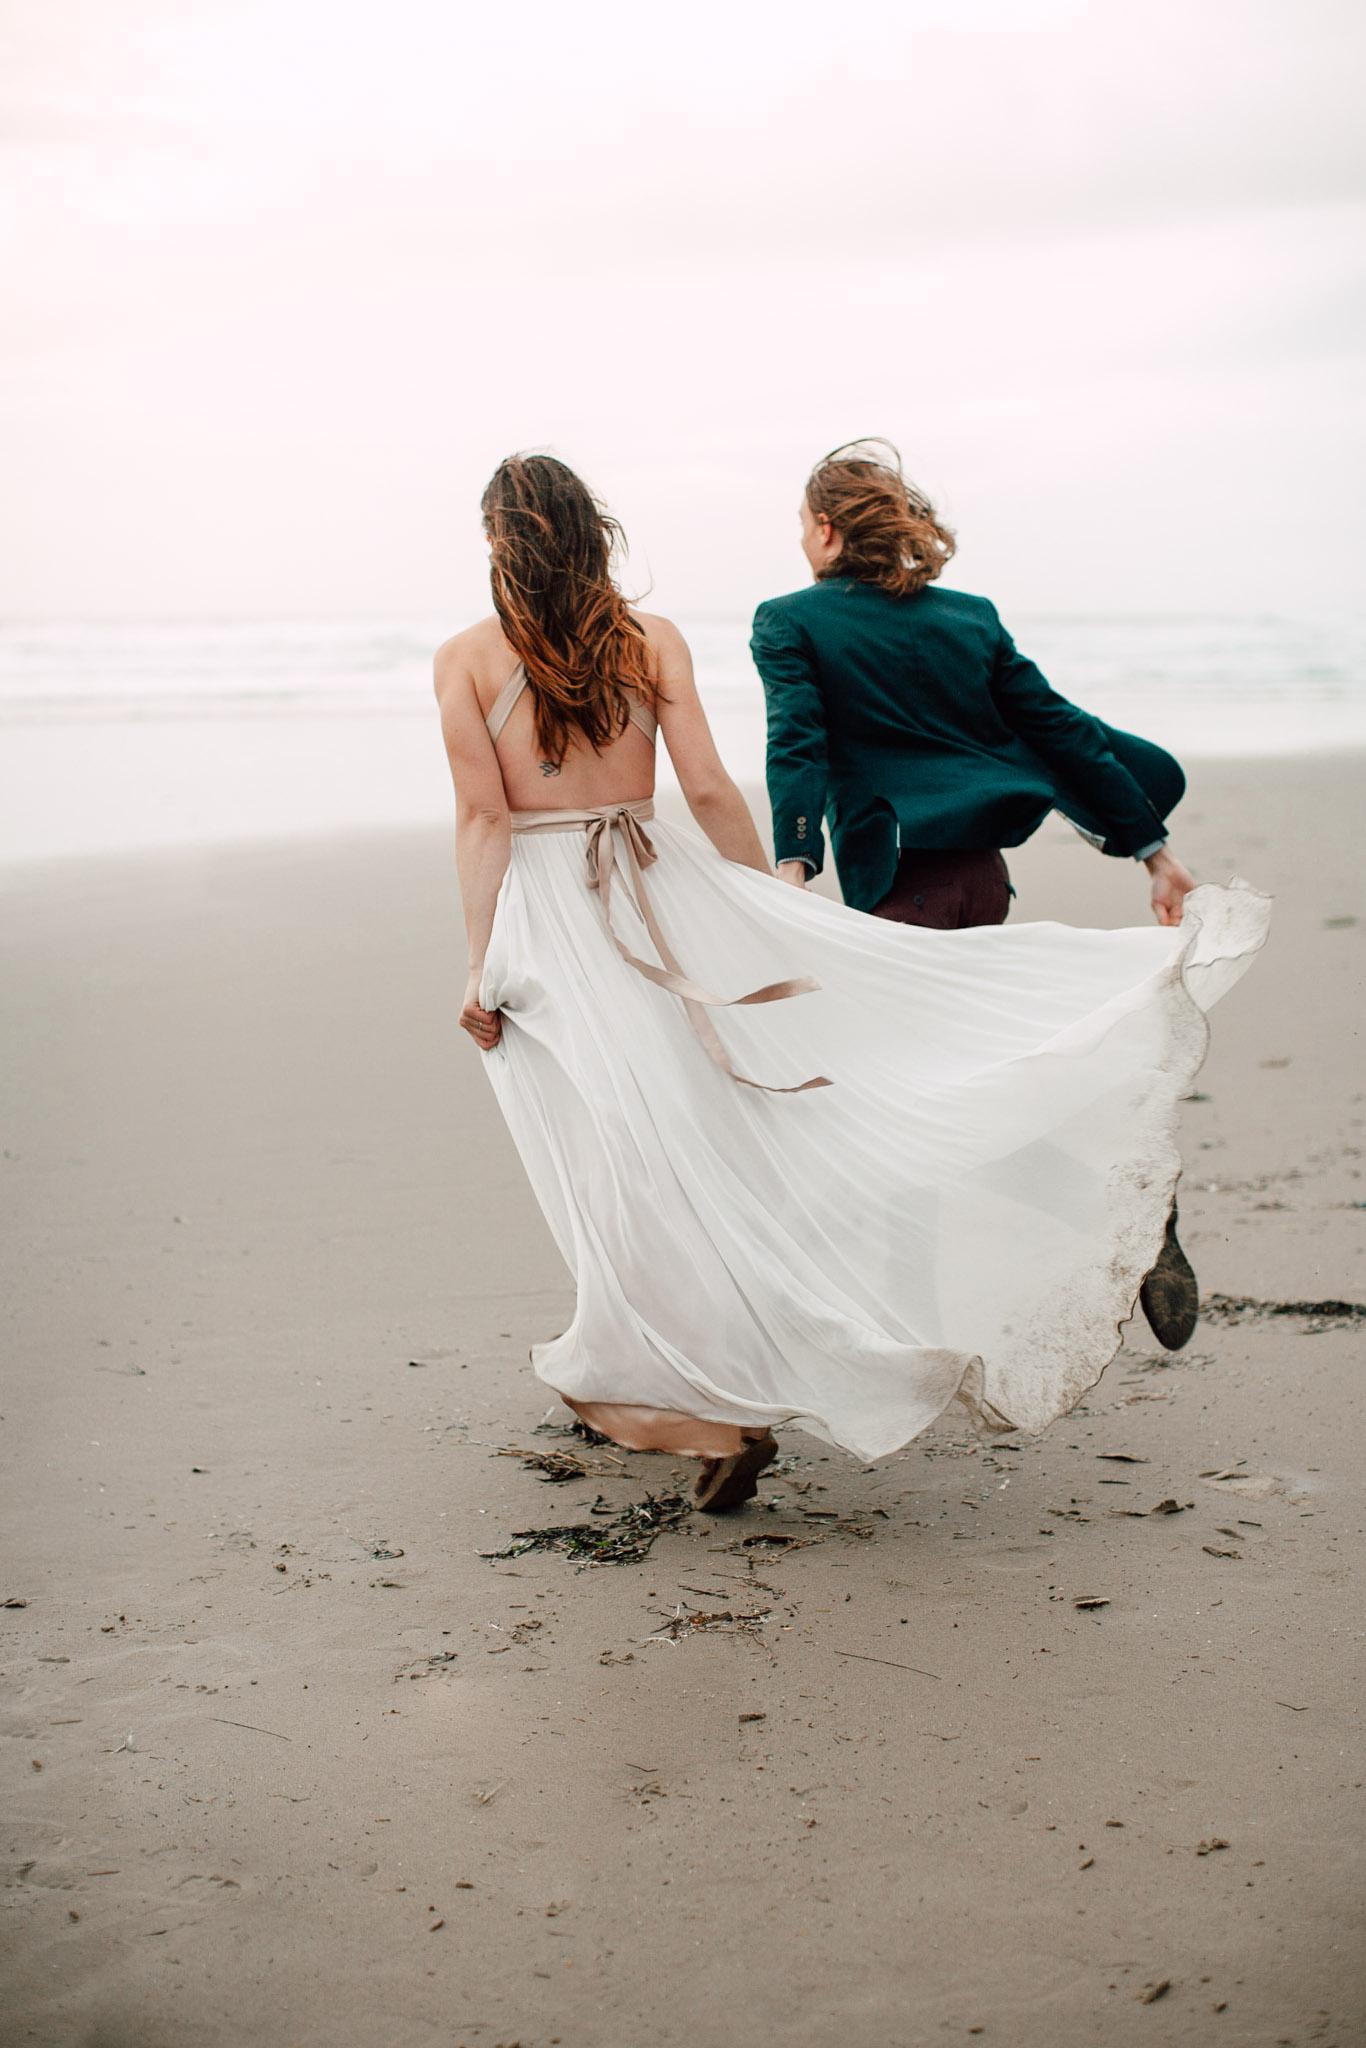 Oregon-Coast-Manzanita-Beach-Engagement-Pia-Anna-Christian-Wedding-Photography-PNW-GB-18.jpg